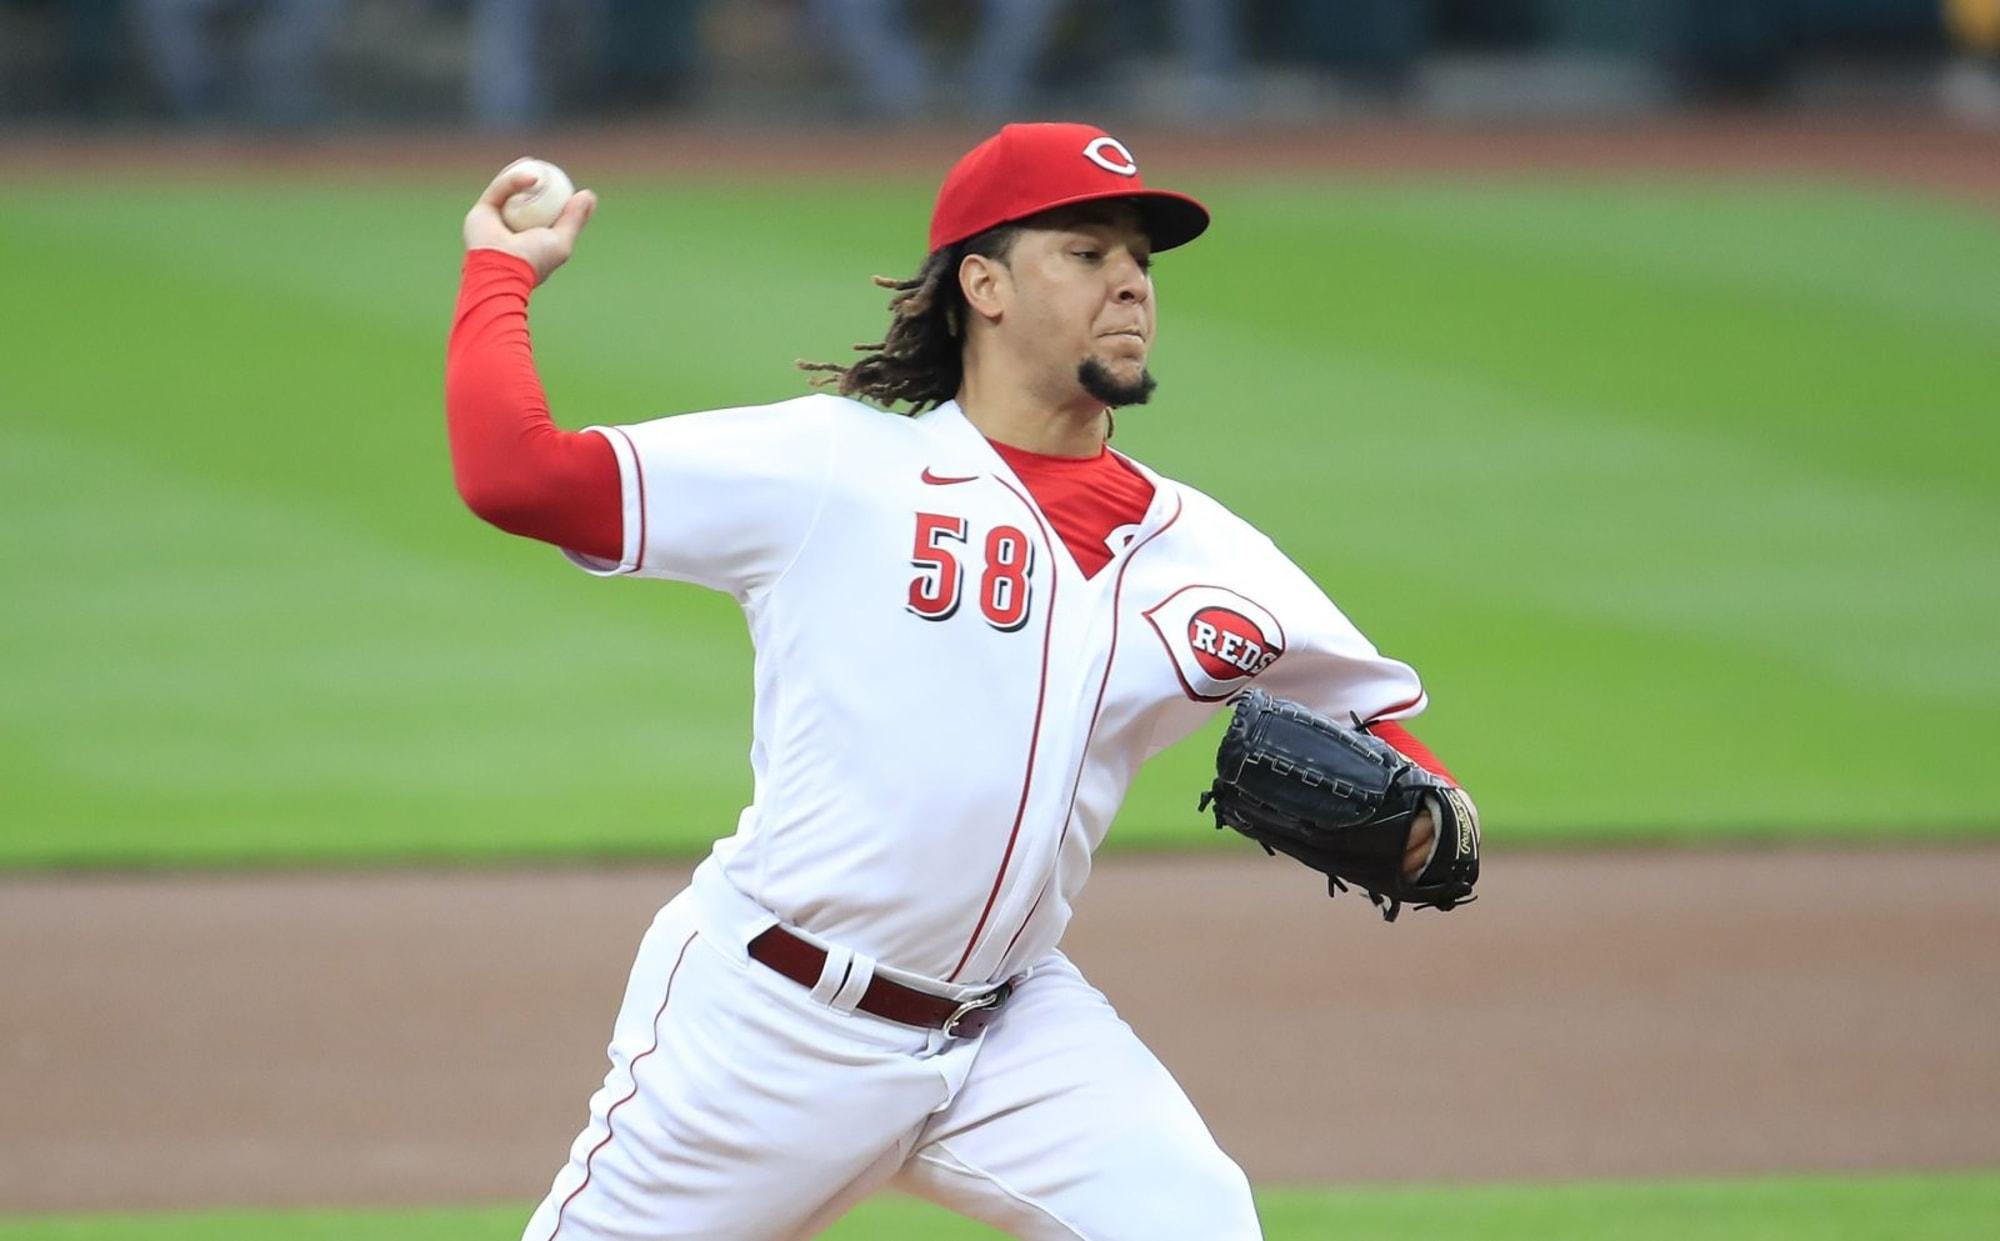 Yankees: MLB insider provides update on Luis Castillo trade rumors